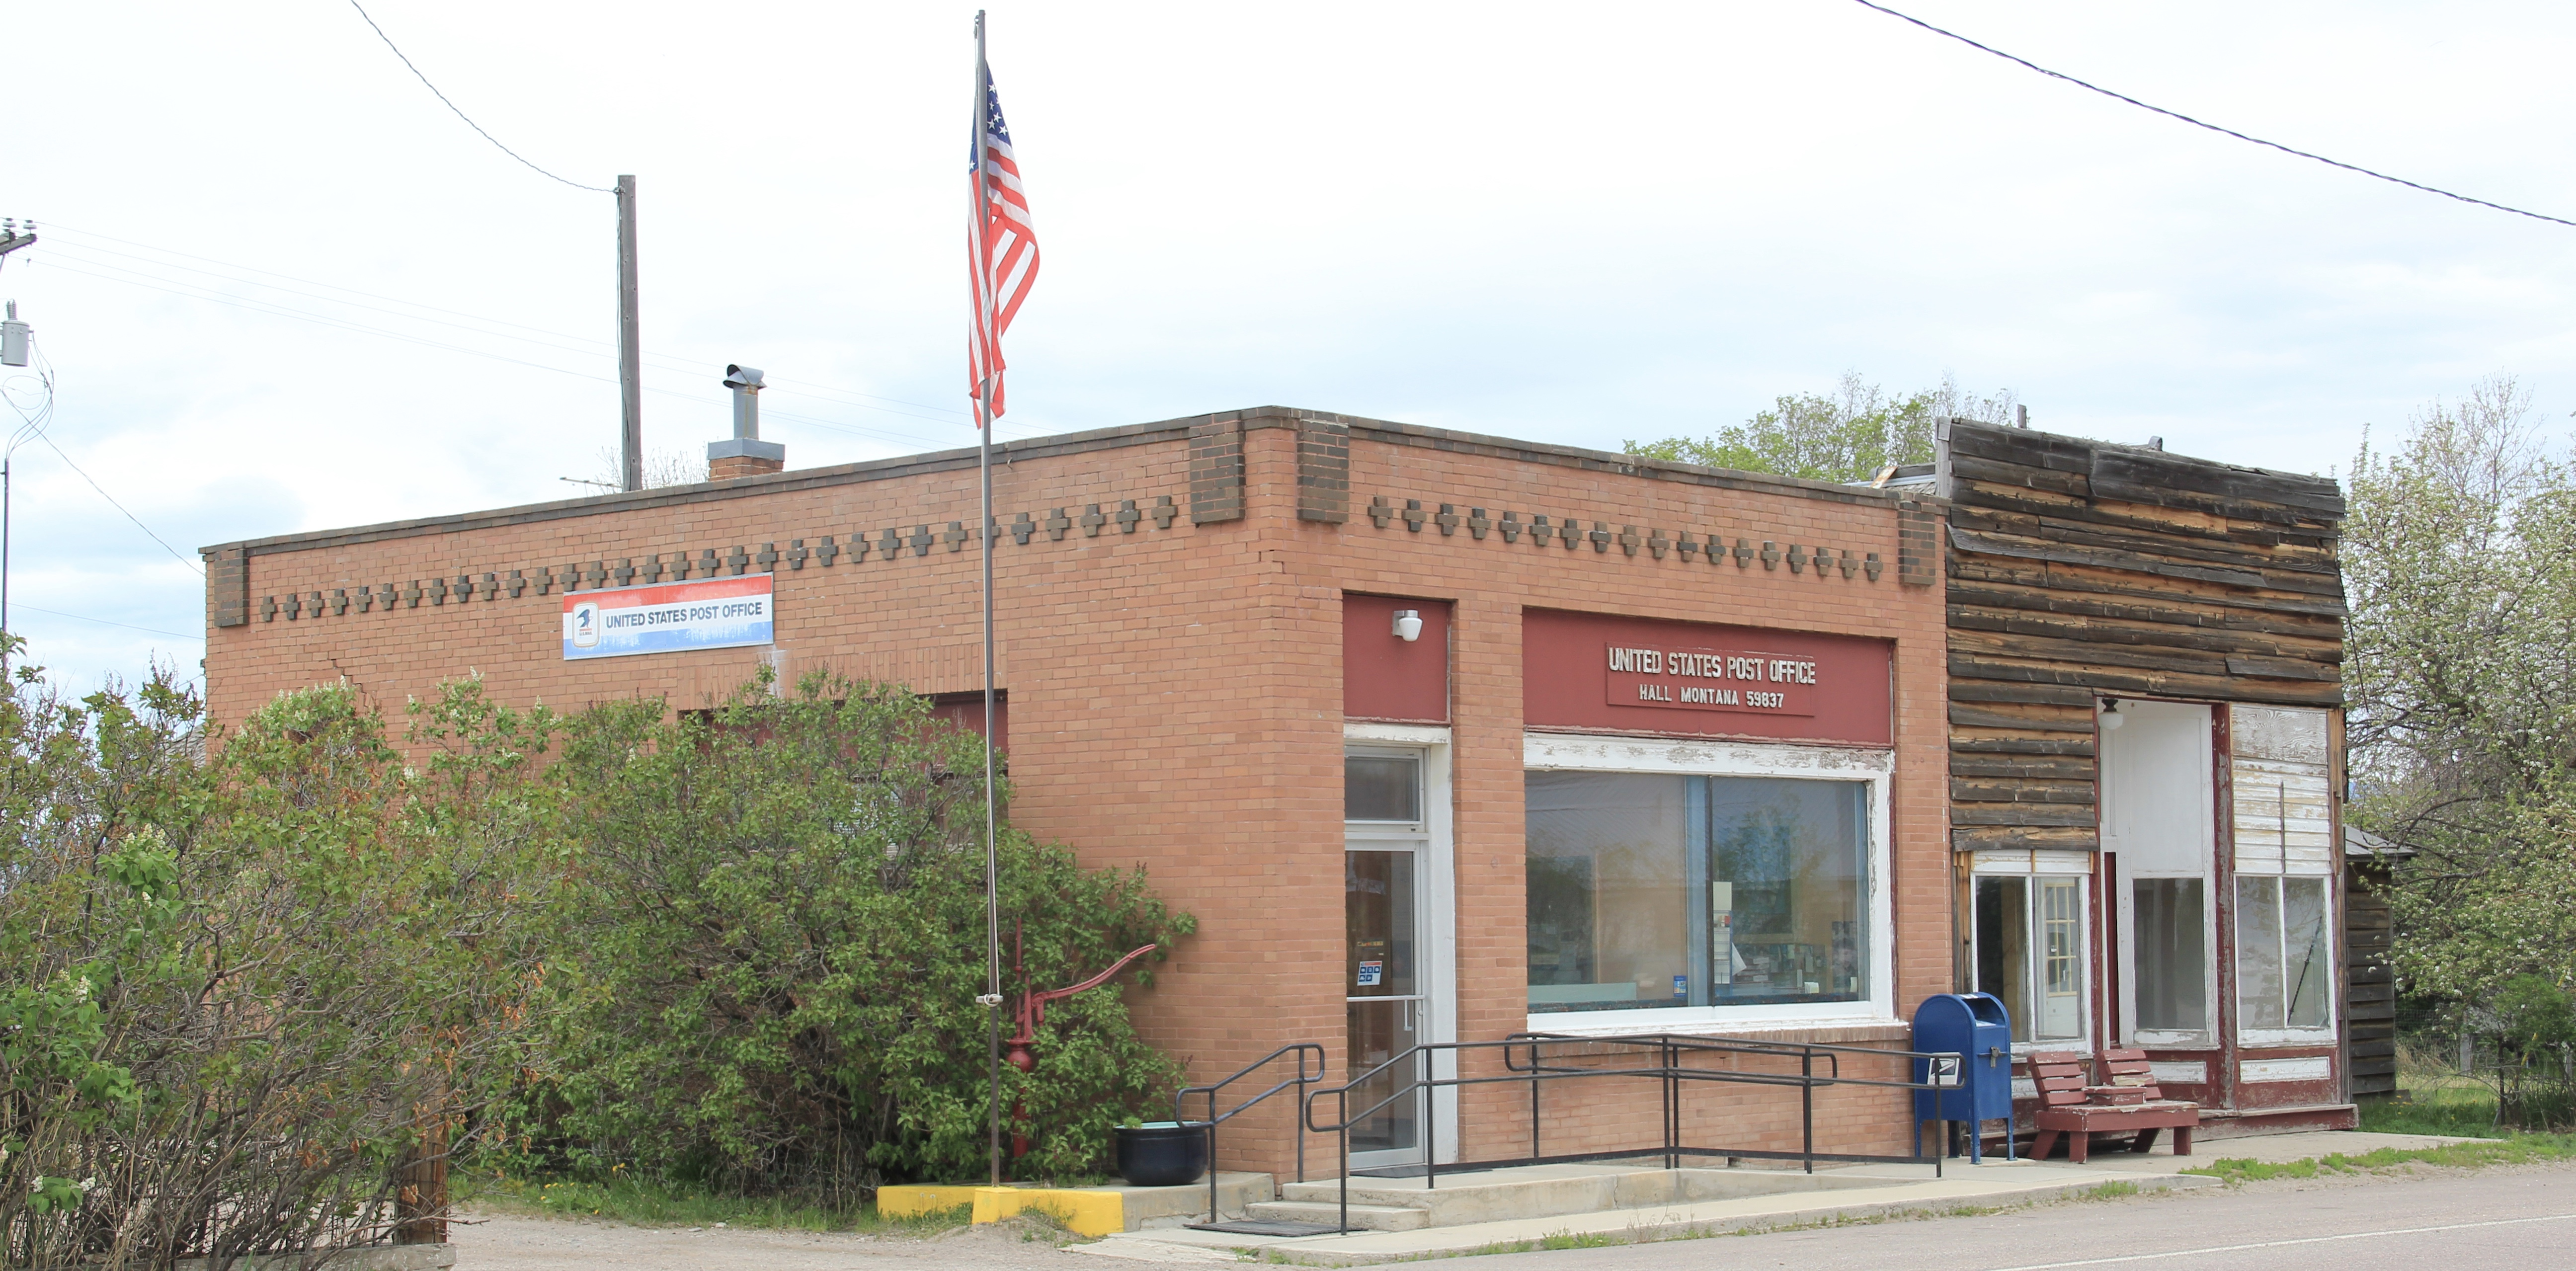 Granite Co, Hall post office, St 512